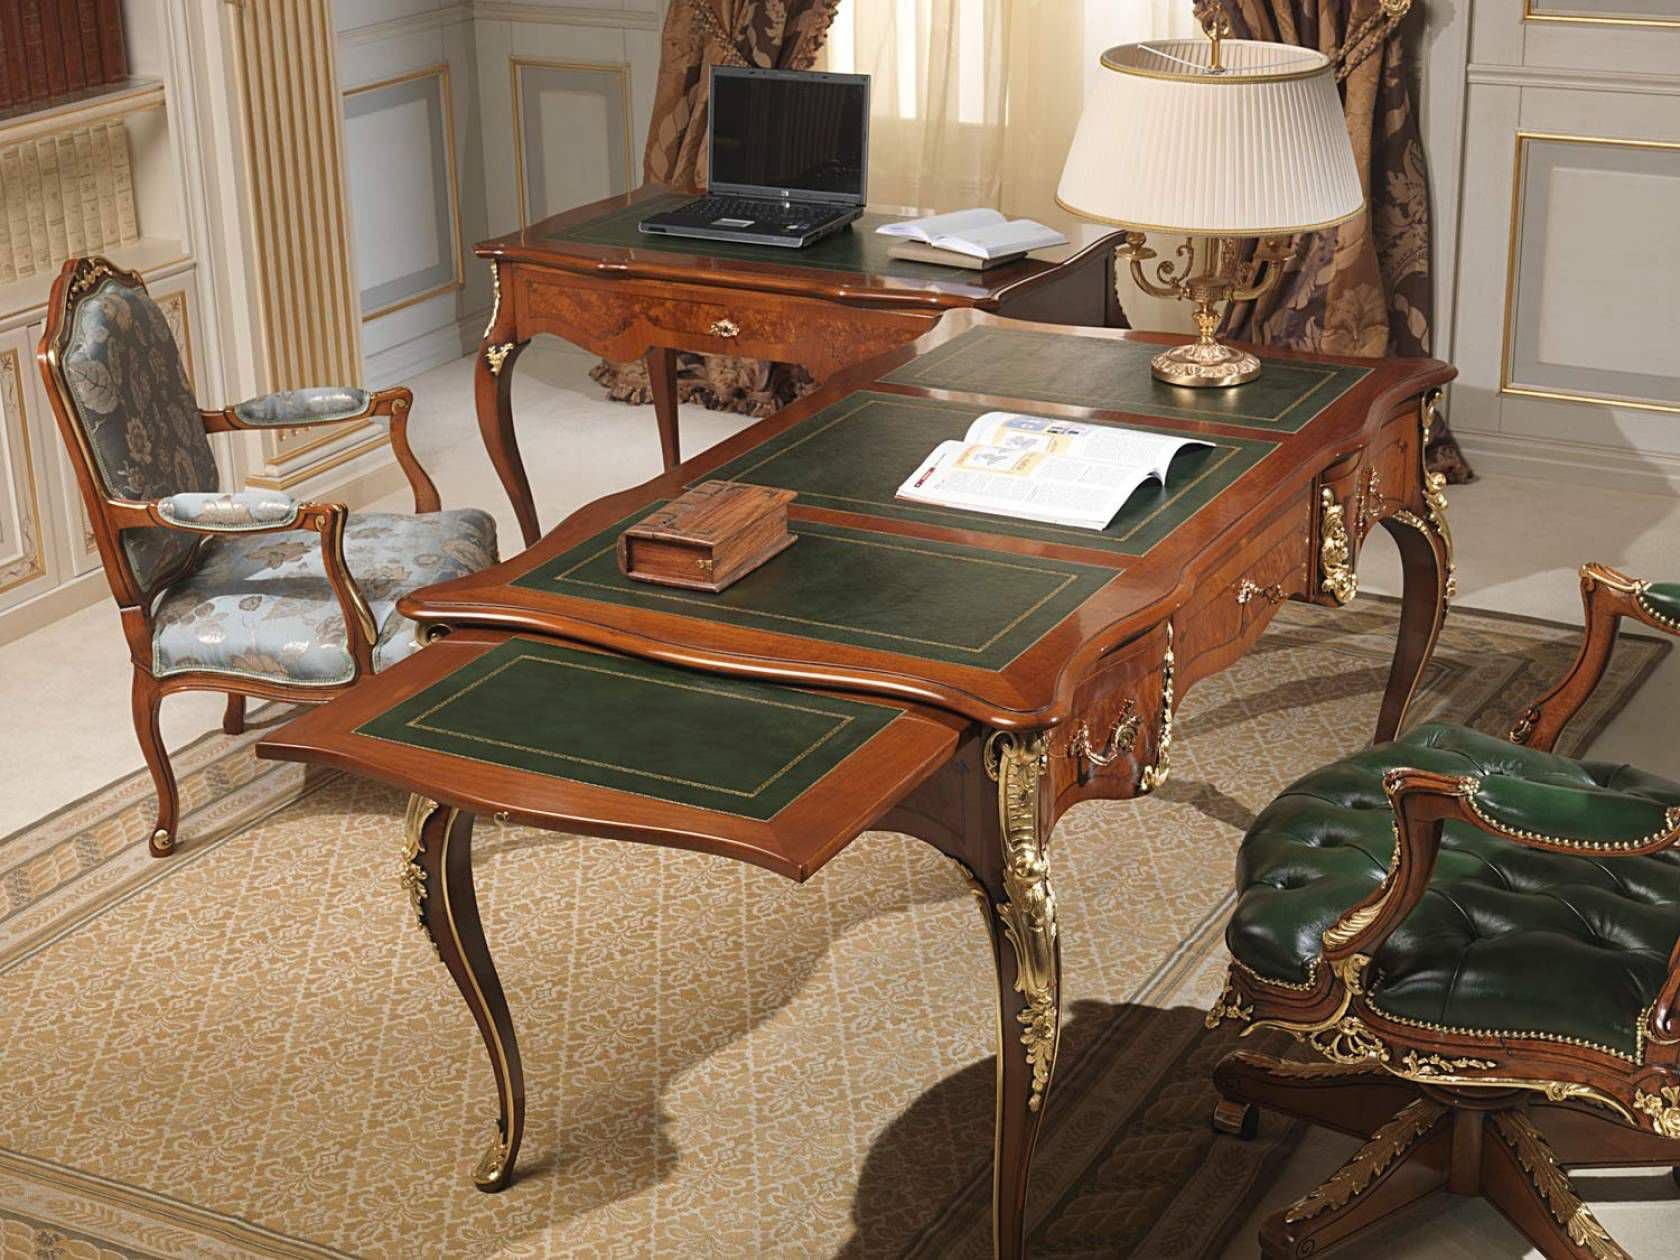 Créa le bureau de louis: crea le bureau de louis xv reconstitution